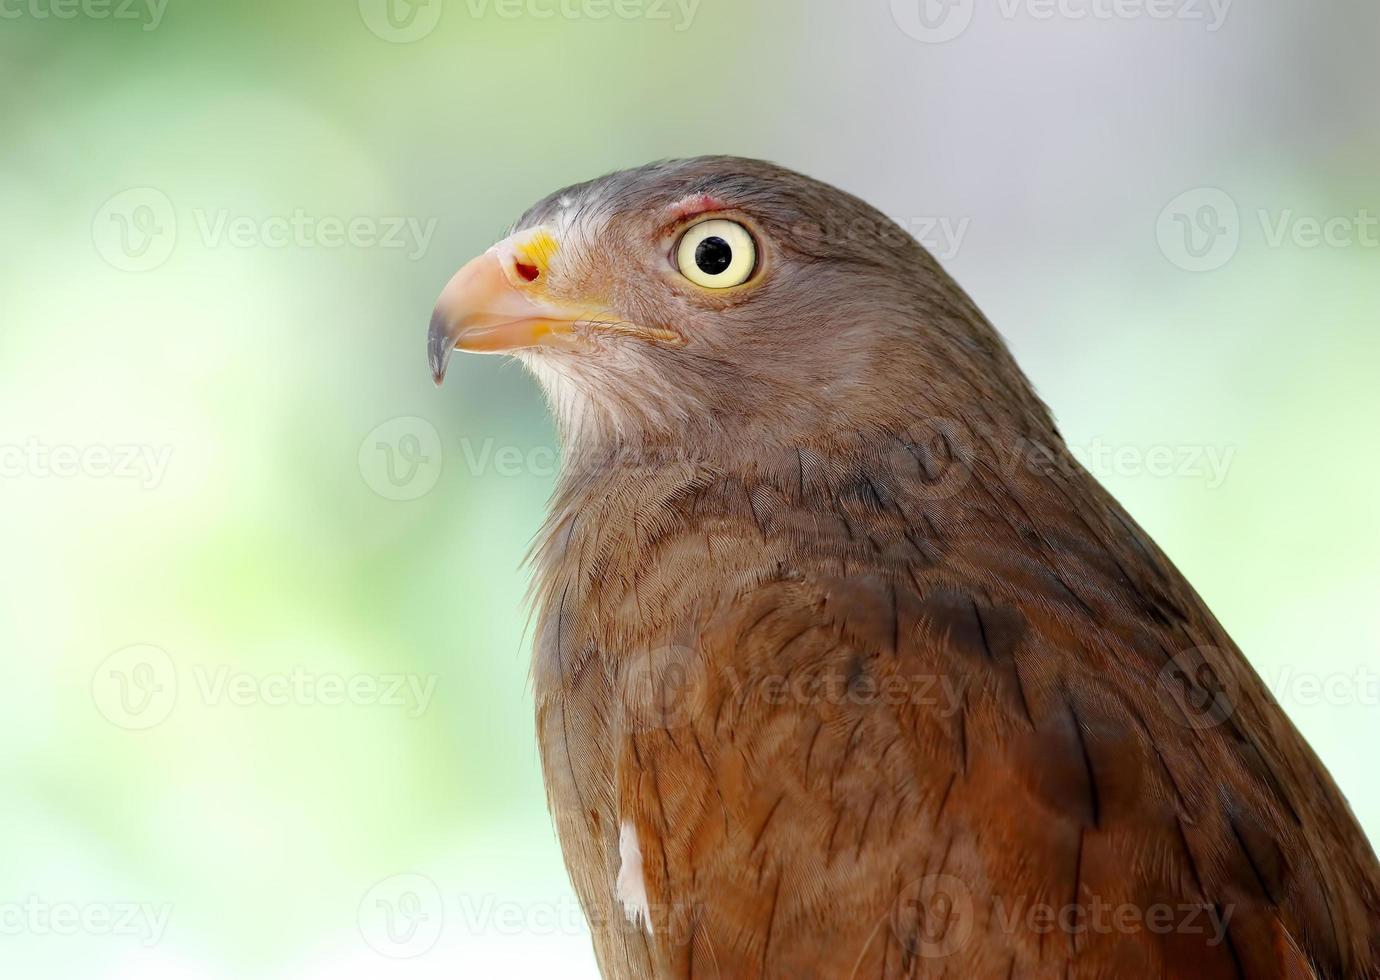 urubu-de-asa-ruiva butastur liventer foto